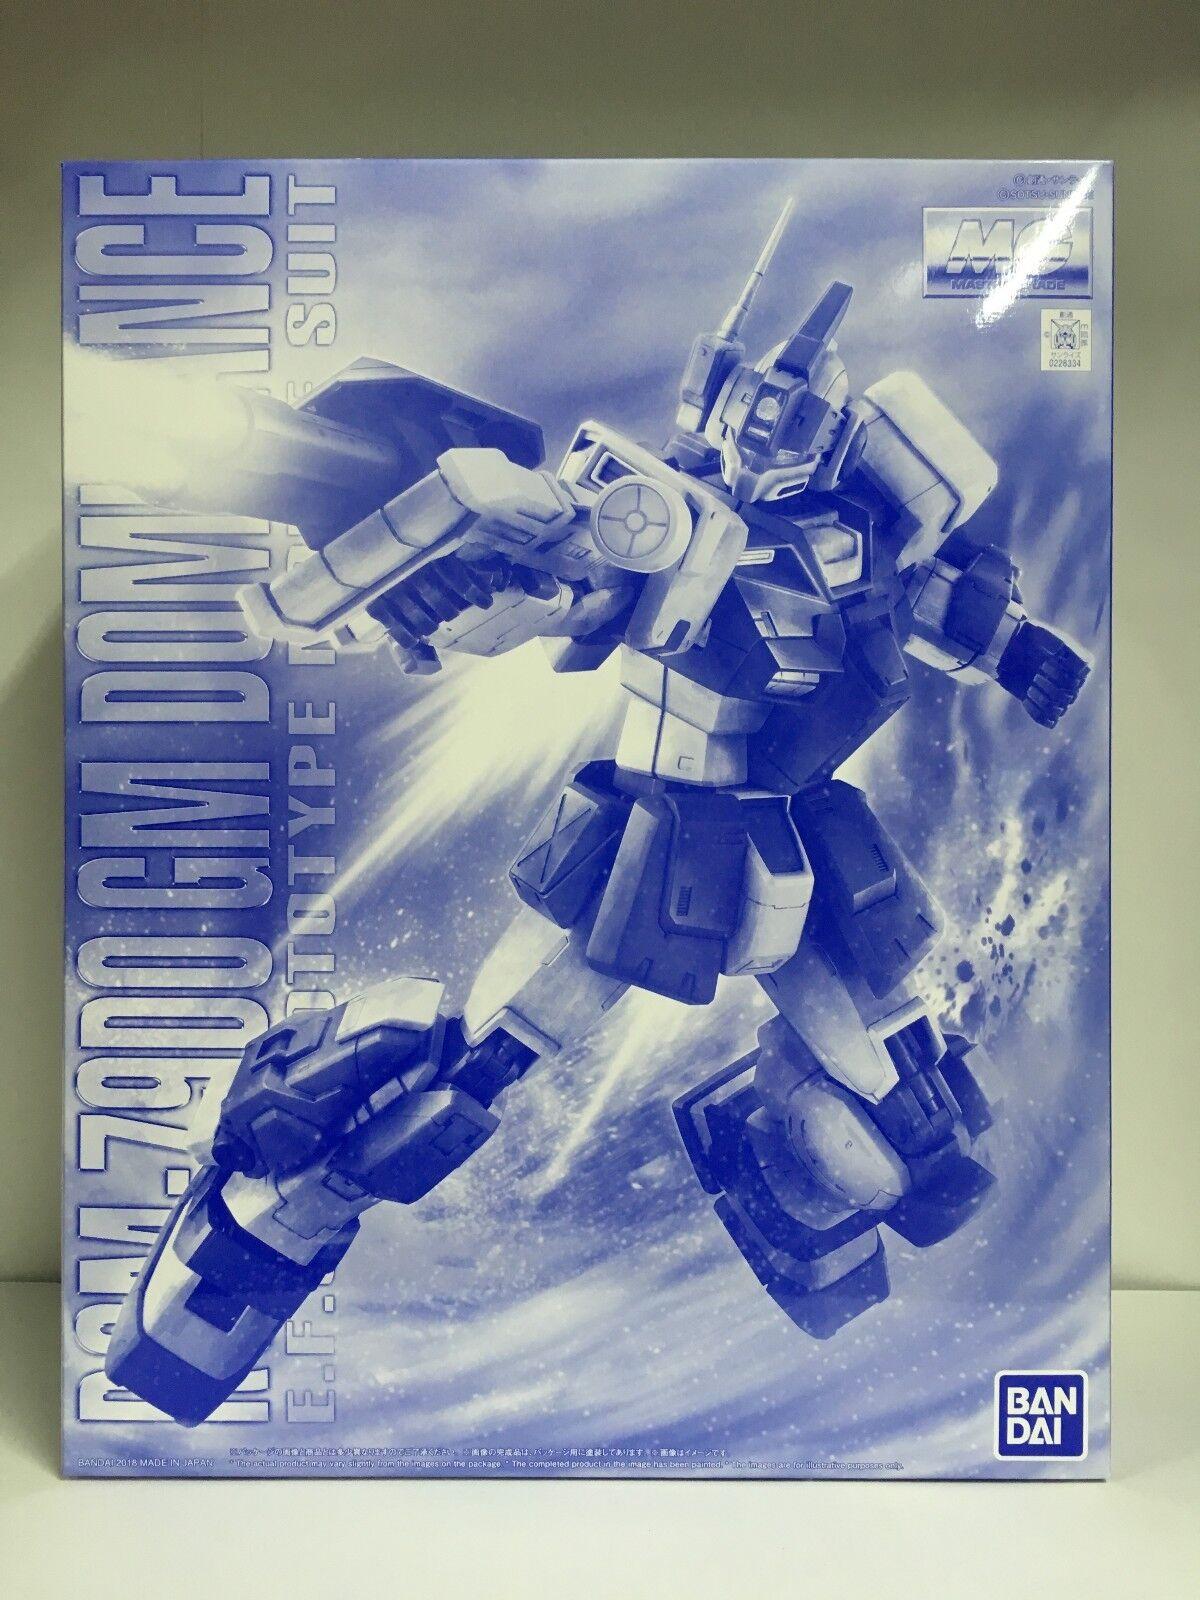 Premium Premium Premium Bandai MG 1 100 RGM-79DO GM Dominance EFSF MS Gundam The bluee Destiny JP 878b44